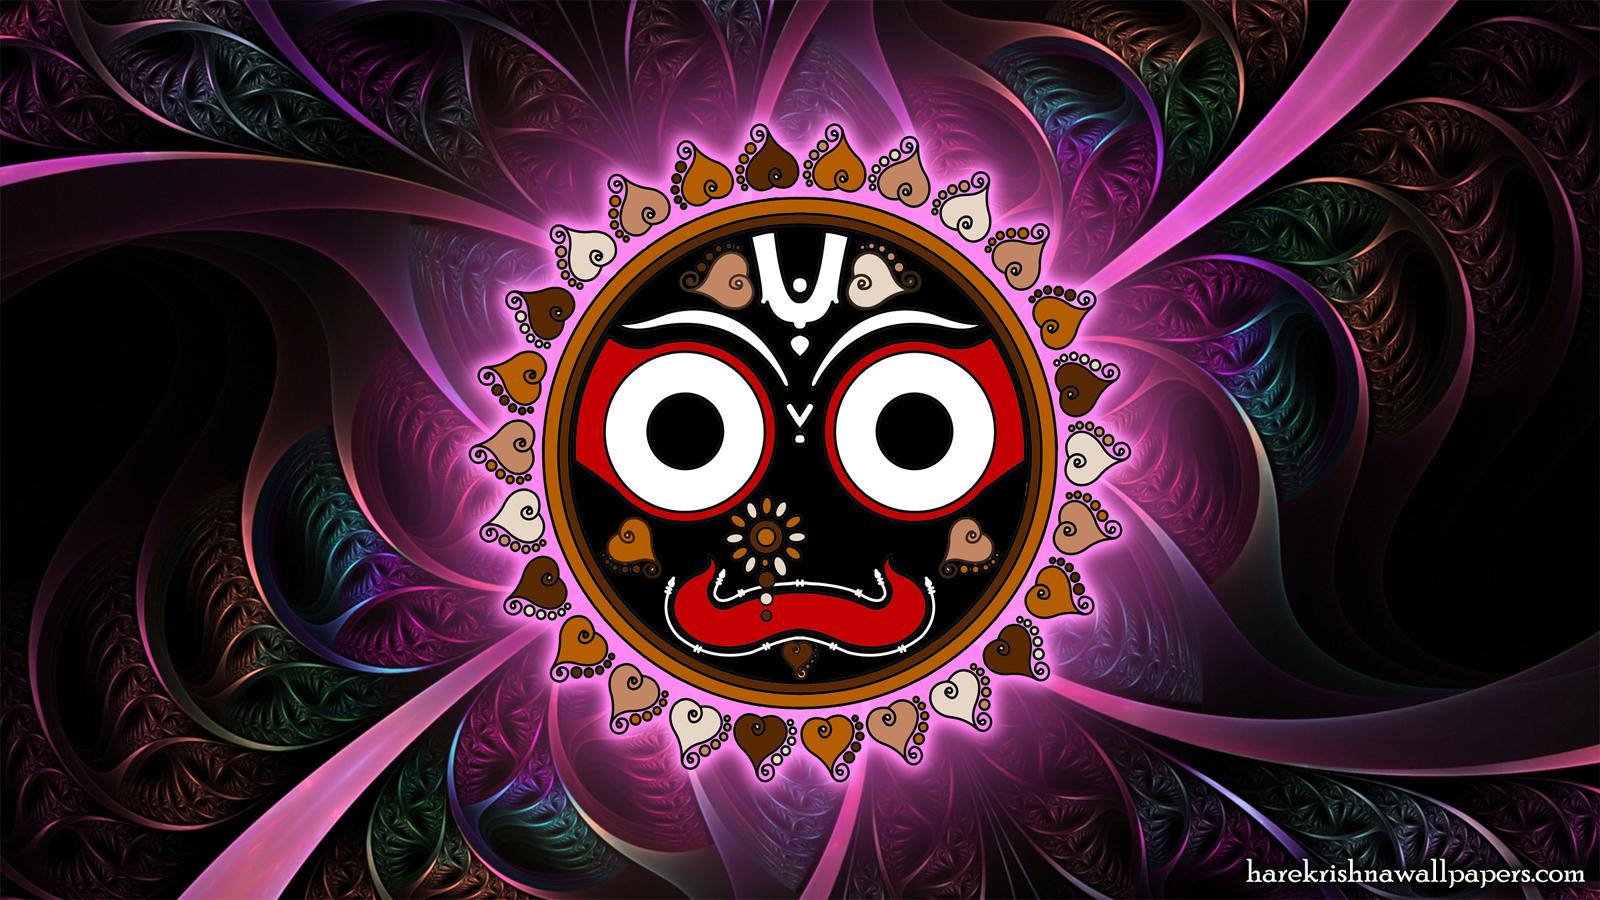 Jai Jagannath Wallpaper (035) Size 1600x900 Download